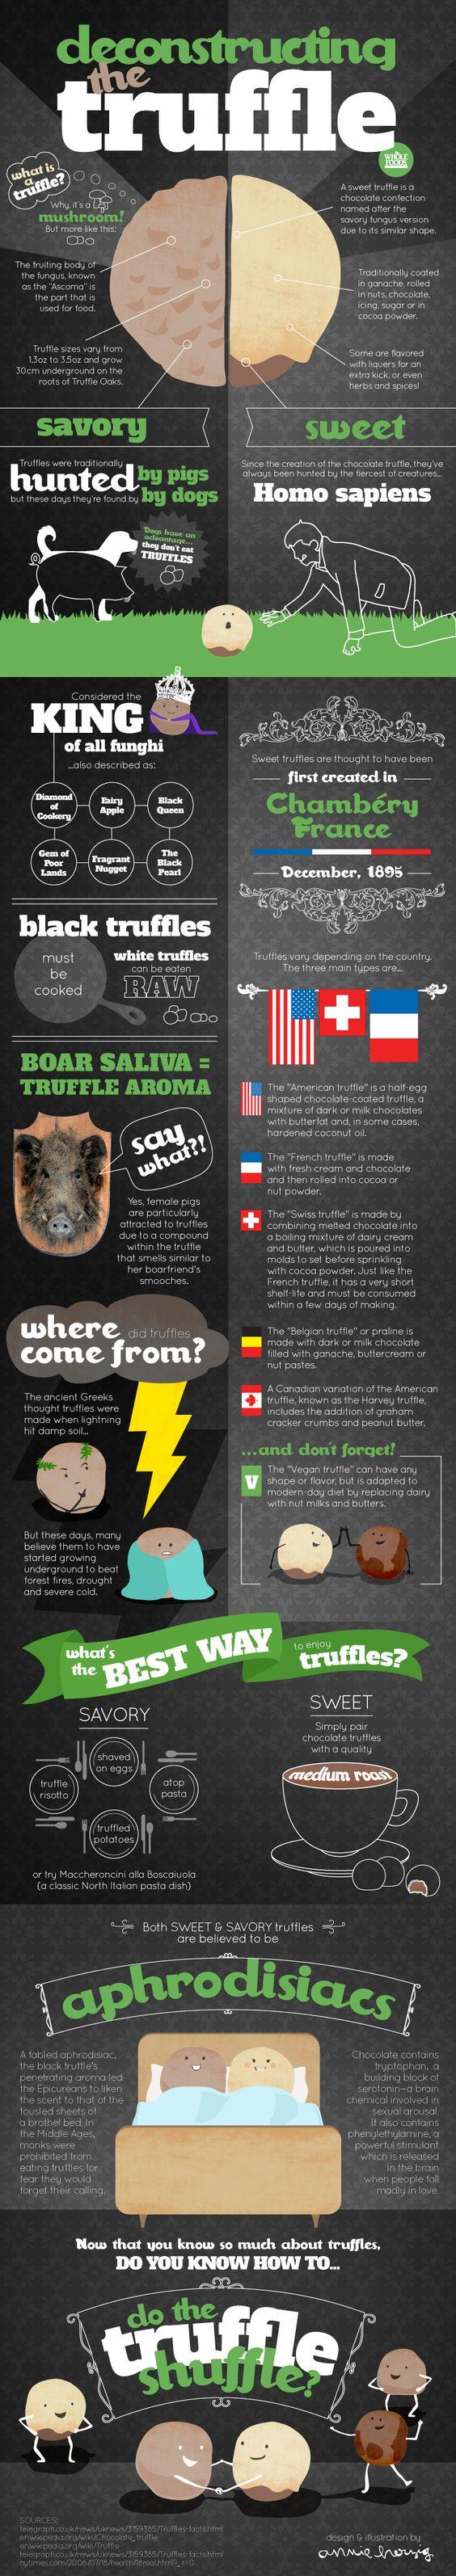 Razor Clam Chowder With Black Truffles Turnips And Thyme